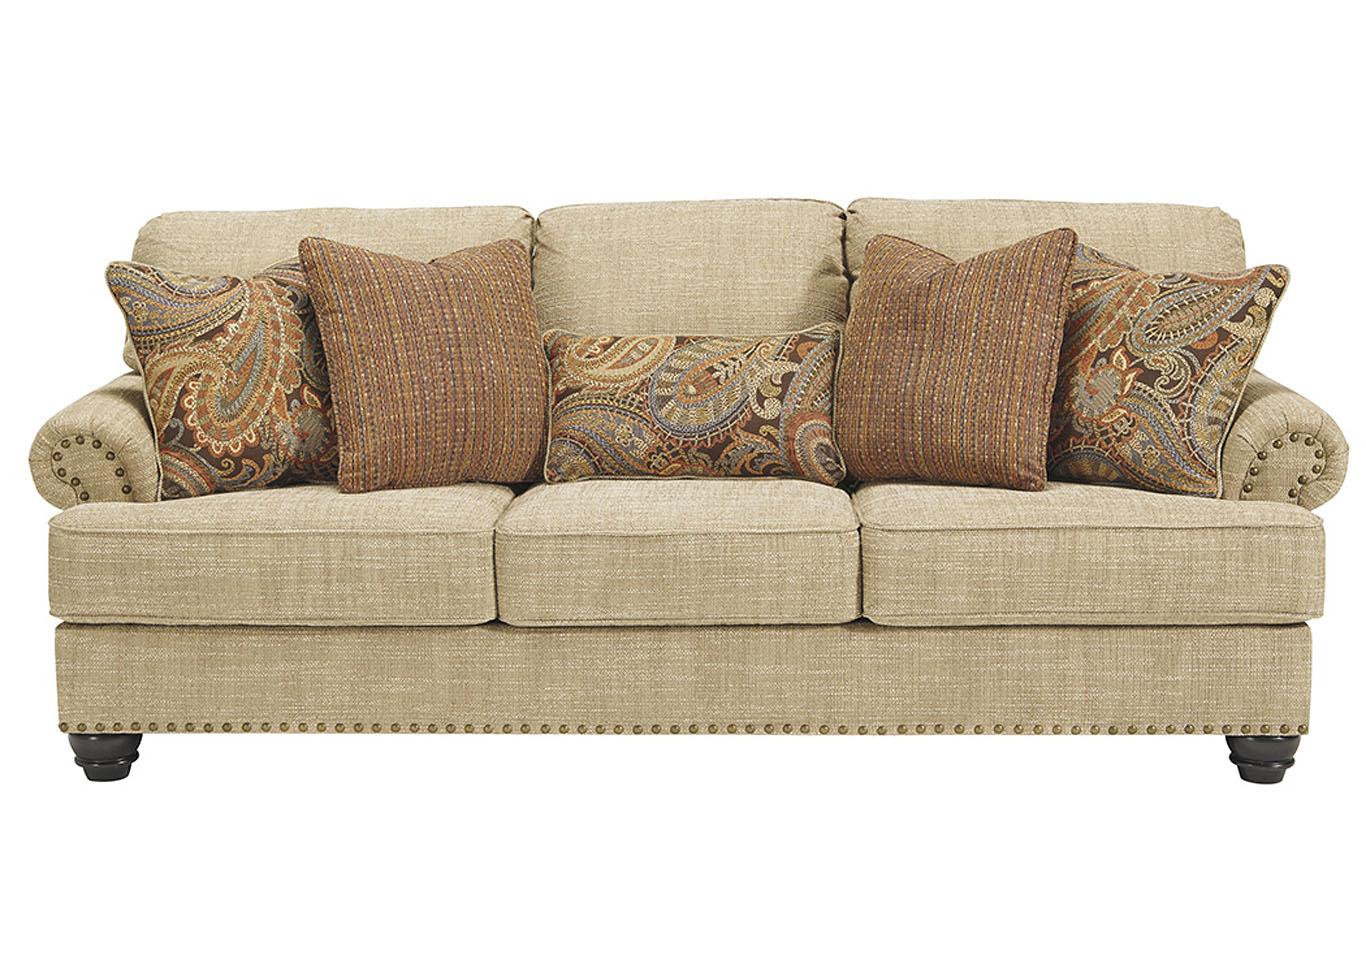 oatmeal sofa bamboo bed forks carolina furniture easton pa candoro benchcraft